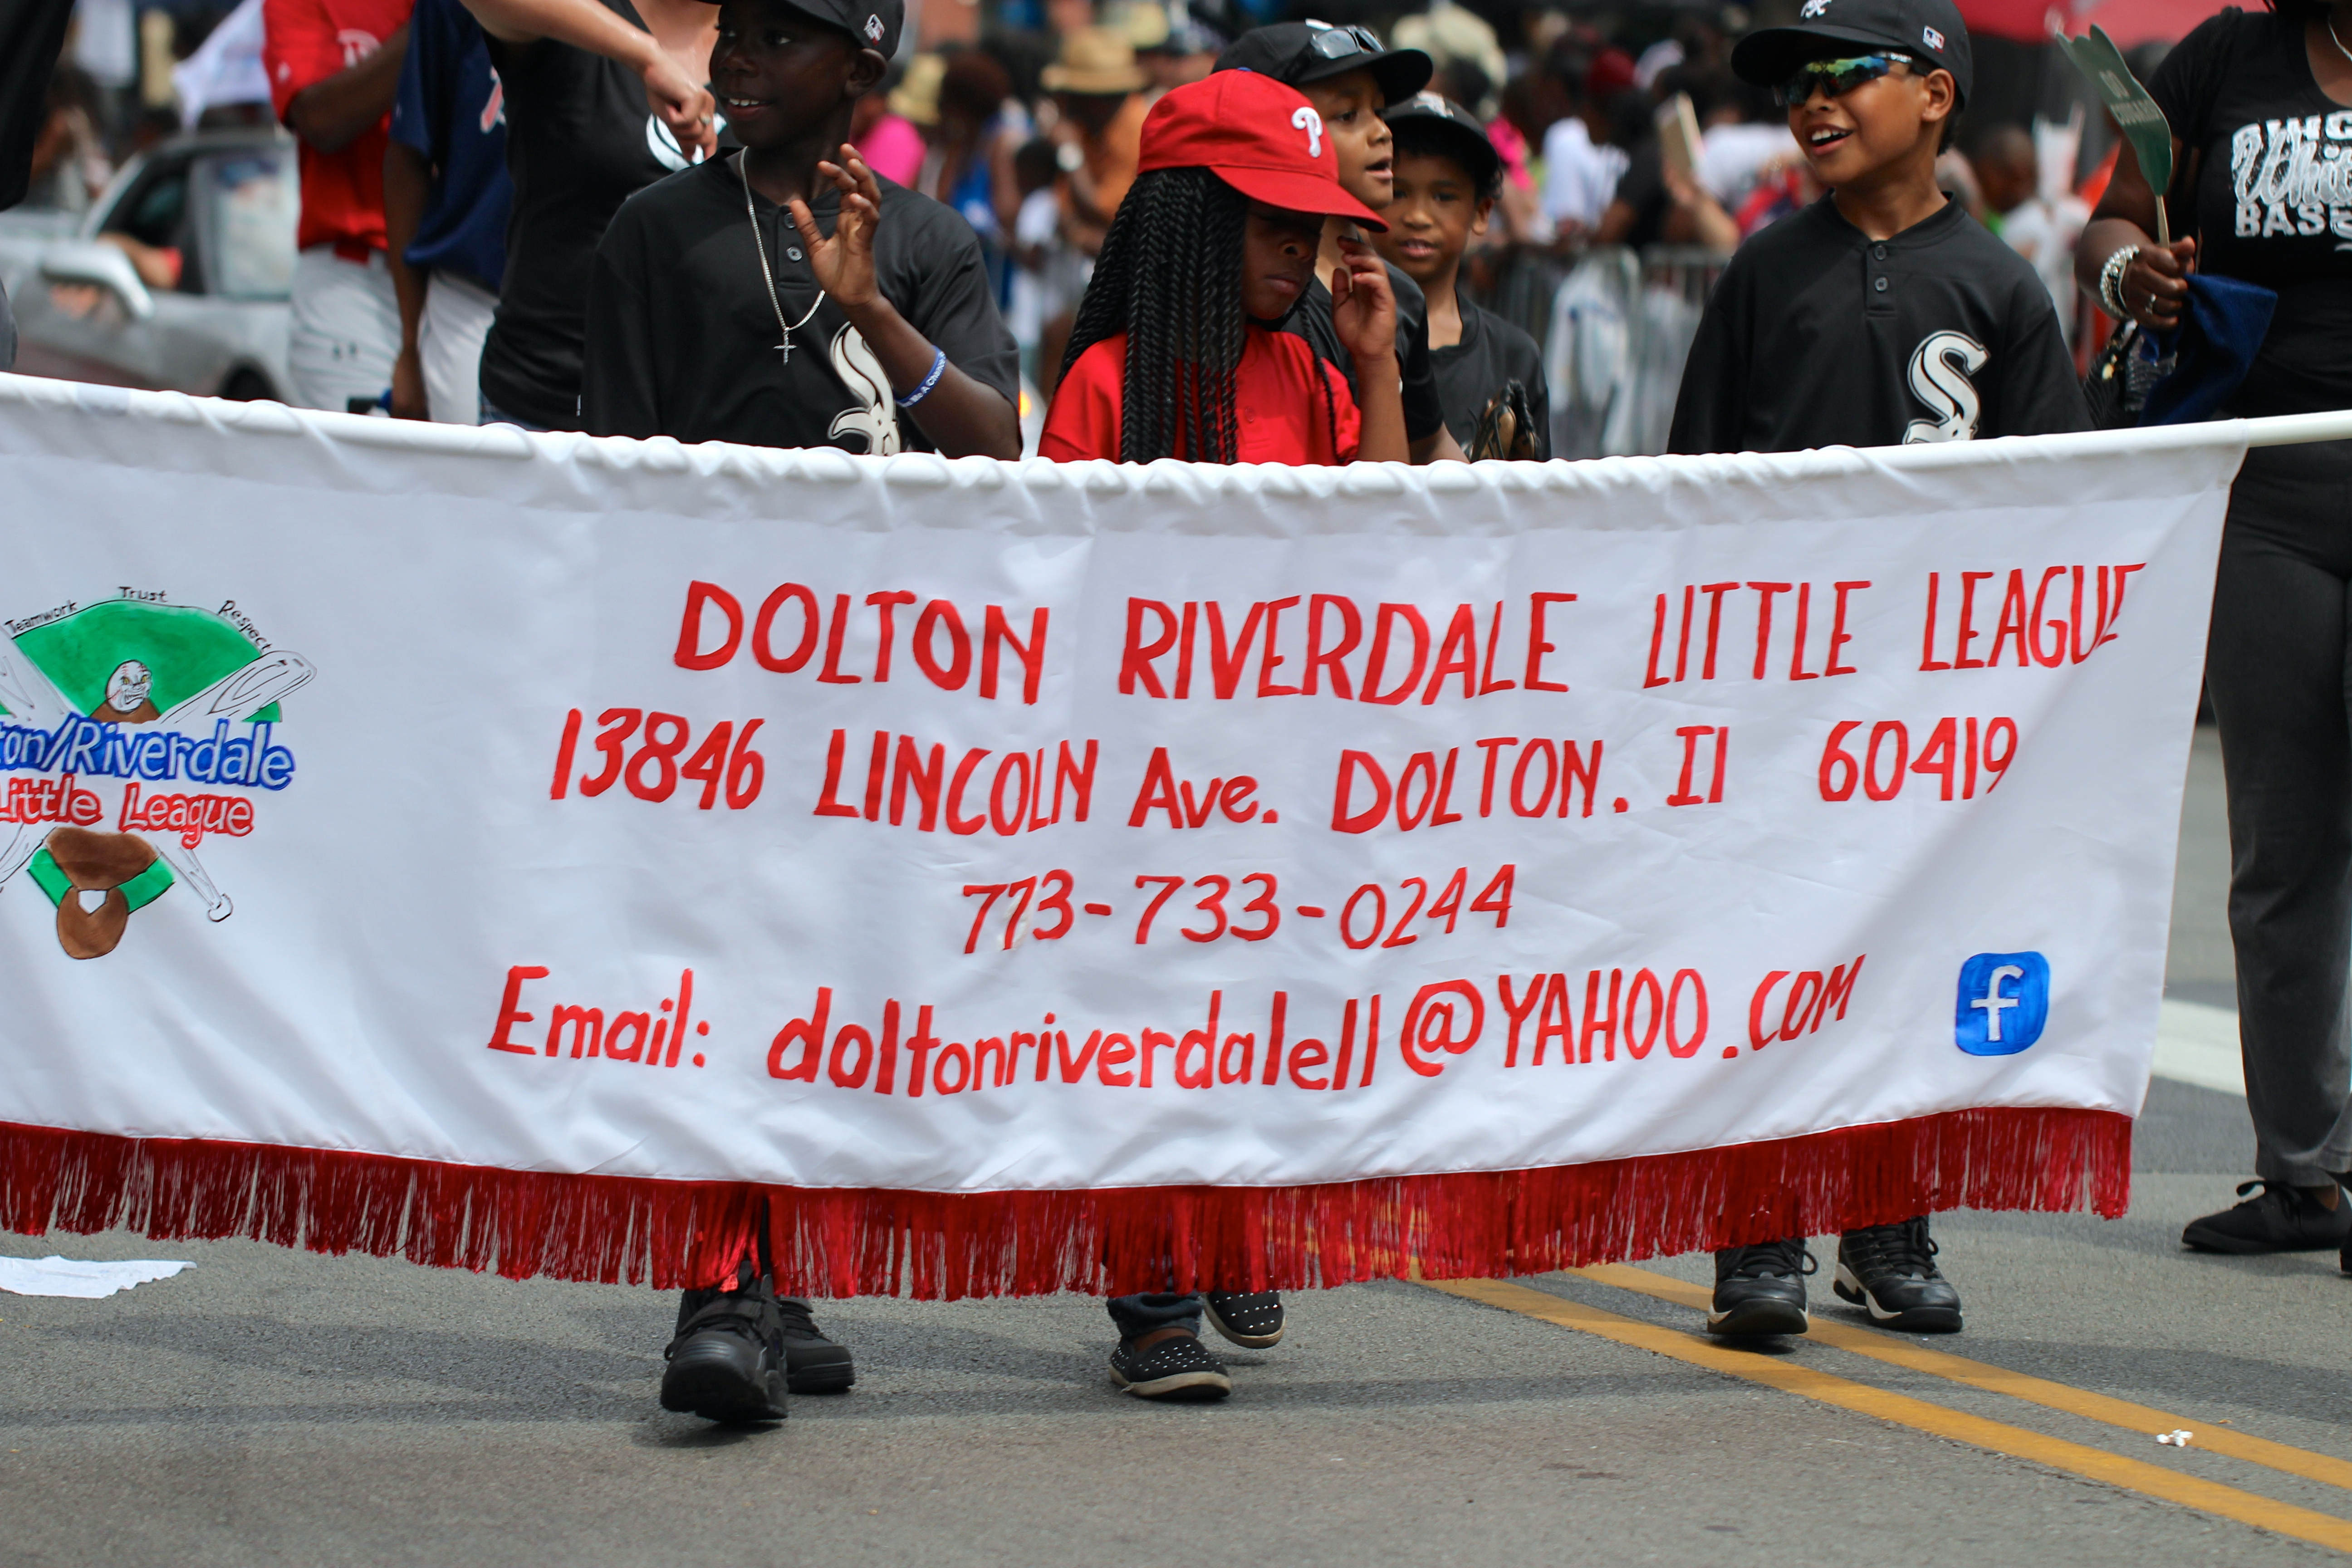 File:Dolton Riverdale Little League at the Bud Billiken Parade 2015